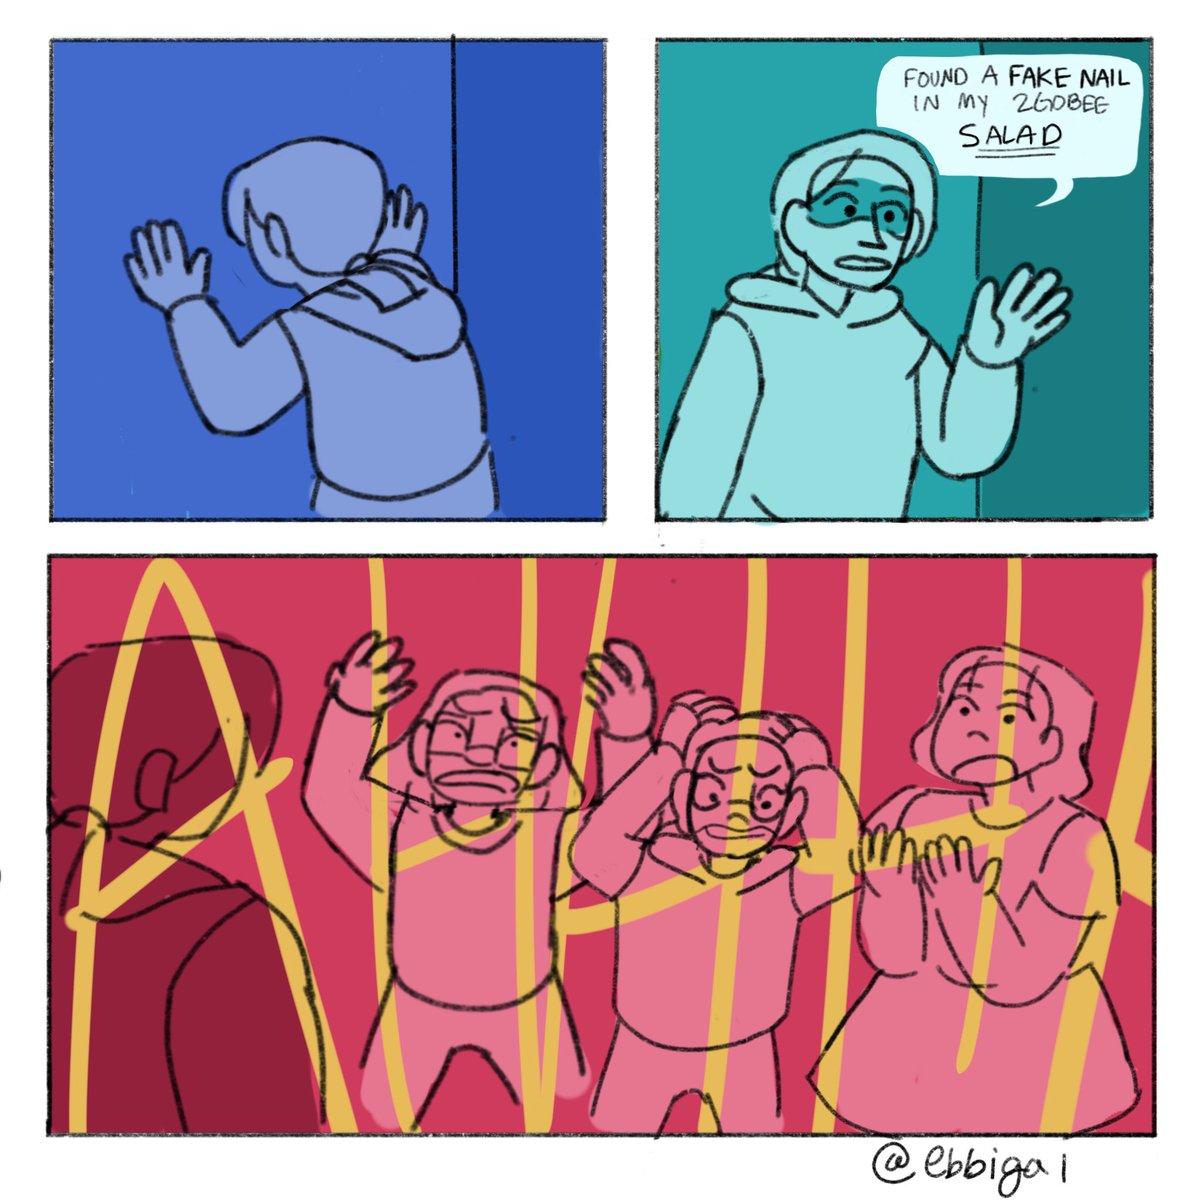 We took it harder than Miranda 😂😂  #dailycomics #comic #procreate #food #whyareweforcedtopayformealplanswhenthefoodcankillus